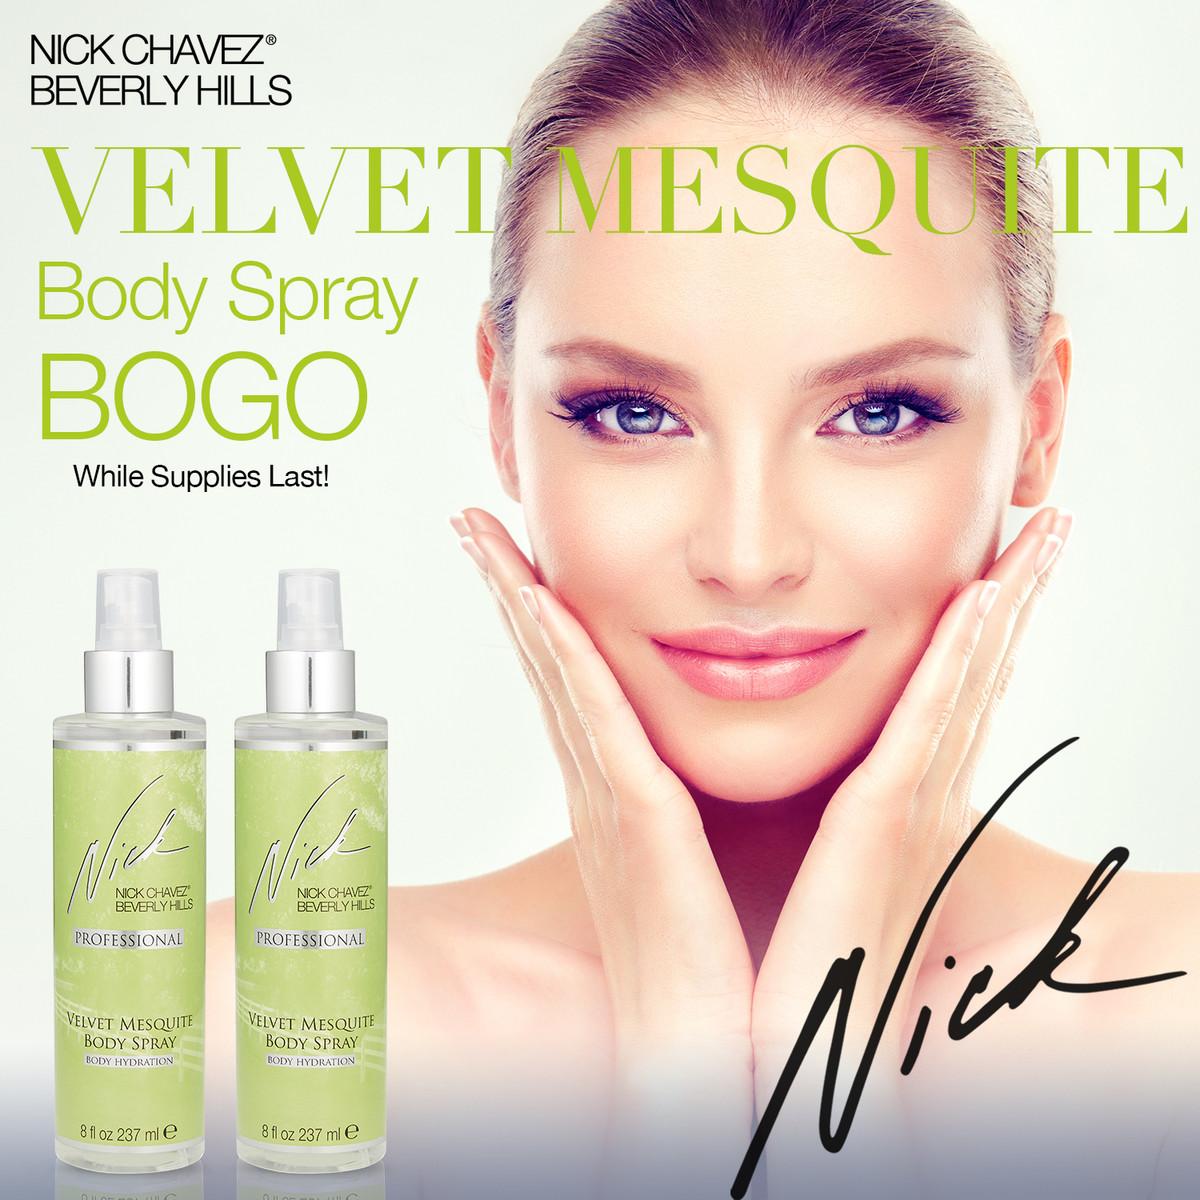 Duo 8oz Velvet Mesquite Body Spray